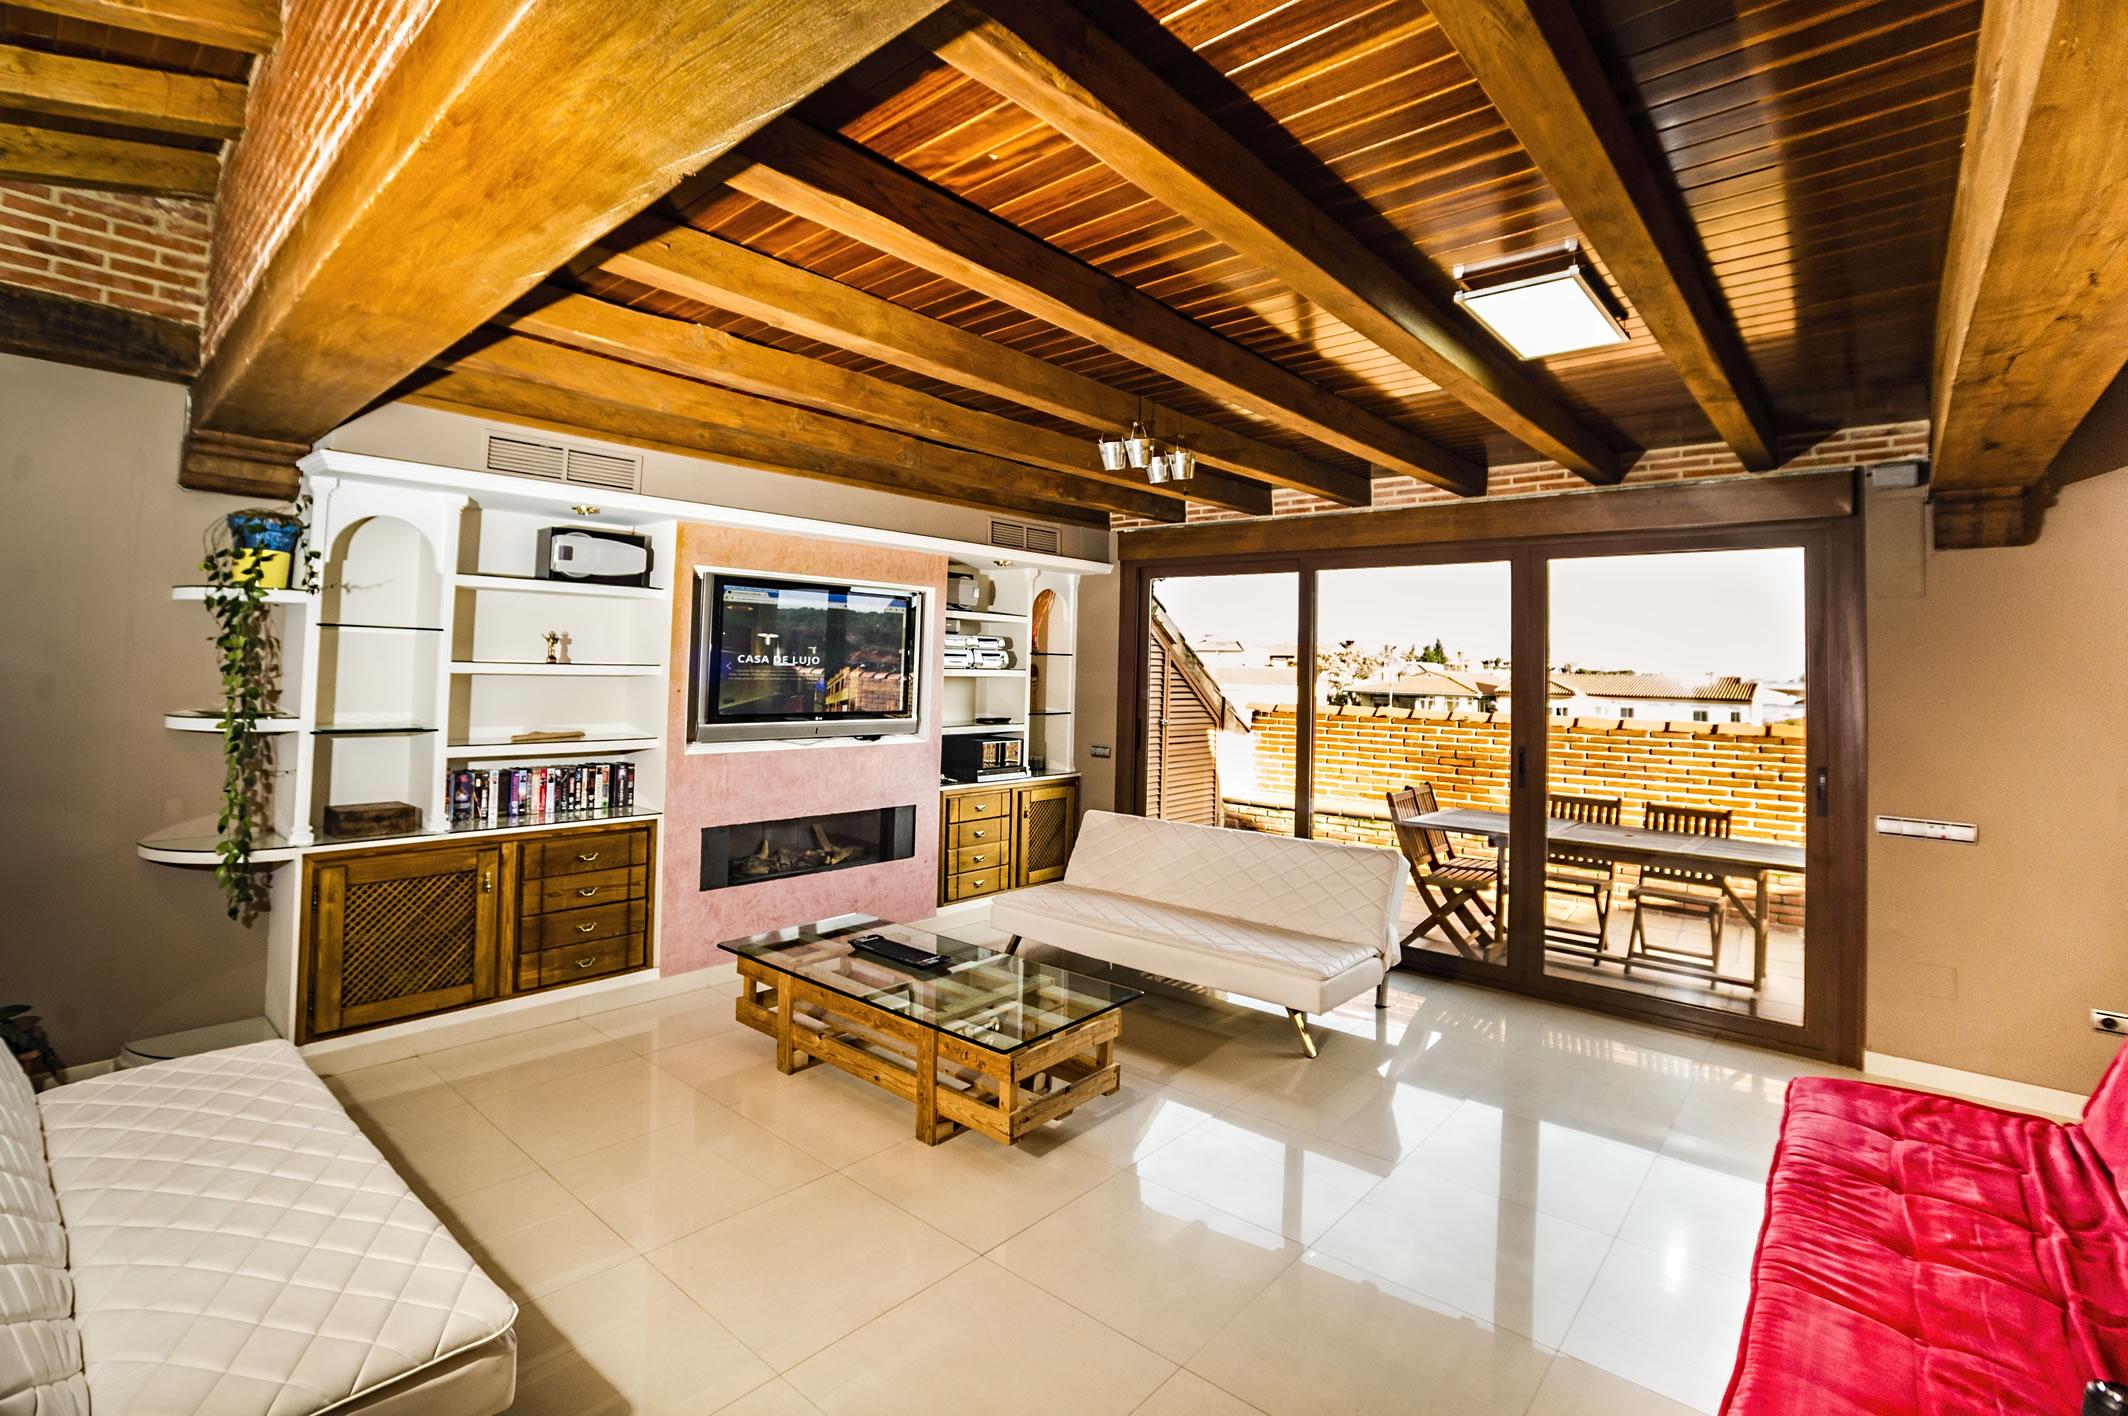 Casa rural spa la chirumba casa rural en salamanca la chirumba con piscina spa jacuzzi chimenea - Casa rural lujo ...